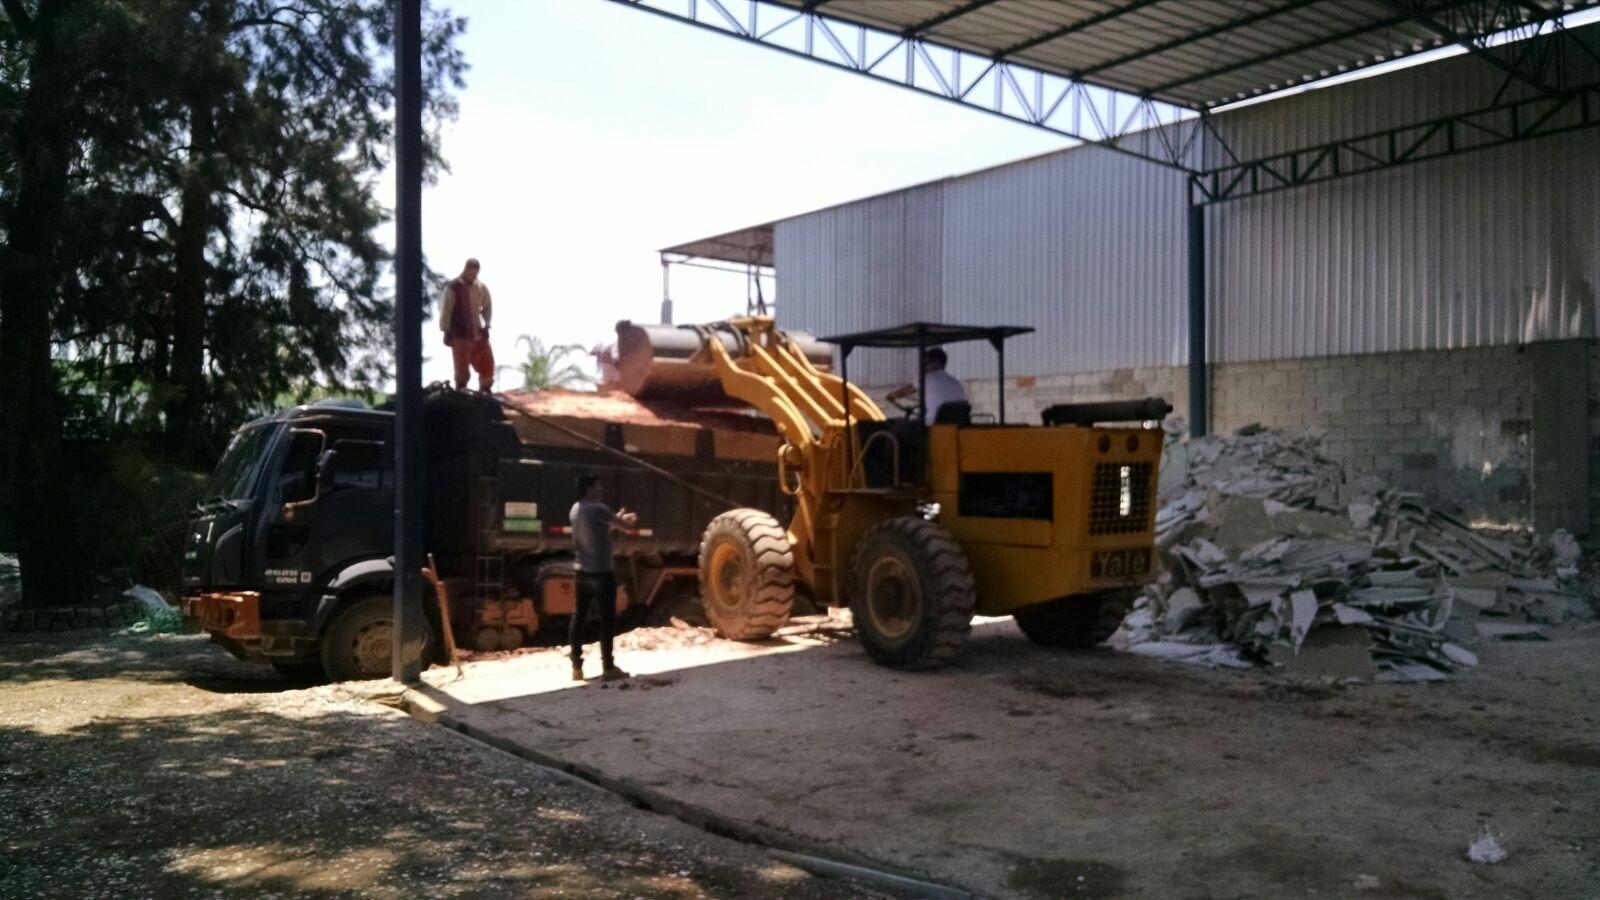 Quanto Custa Serviço de Limpeza de Terreno no Jardim do Carmo - Limpar Terreno